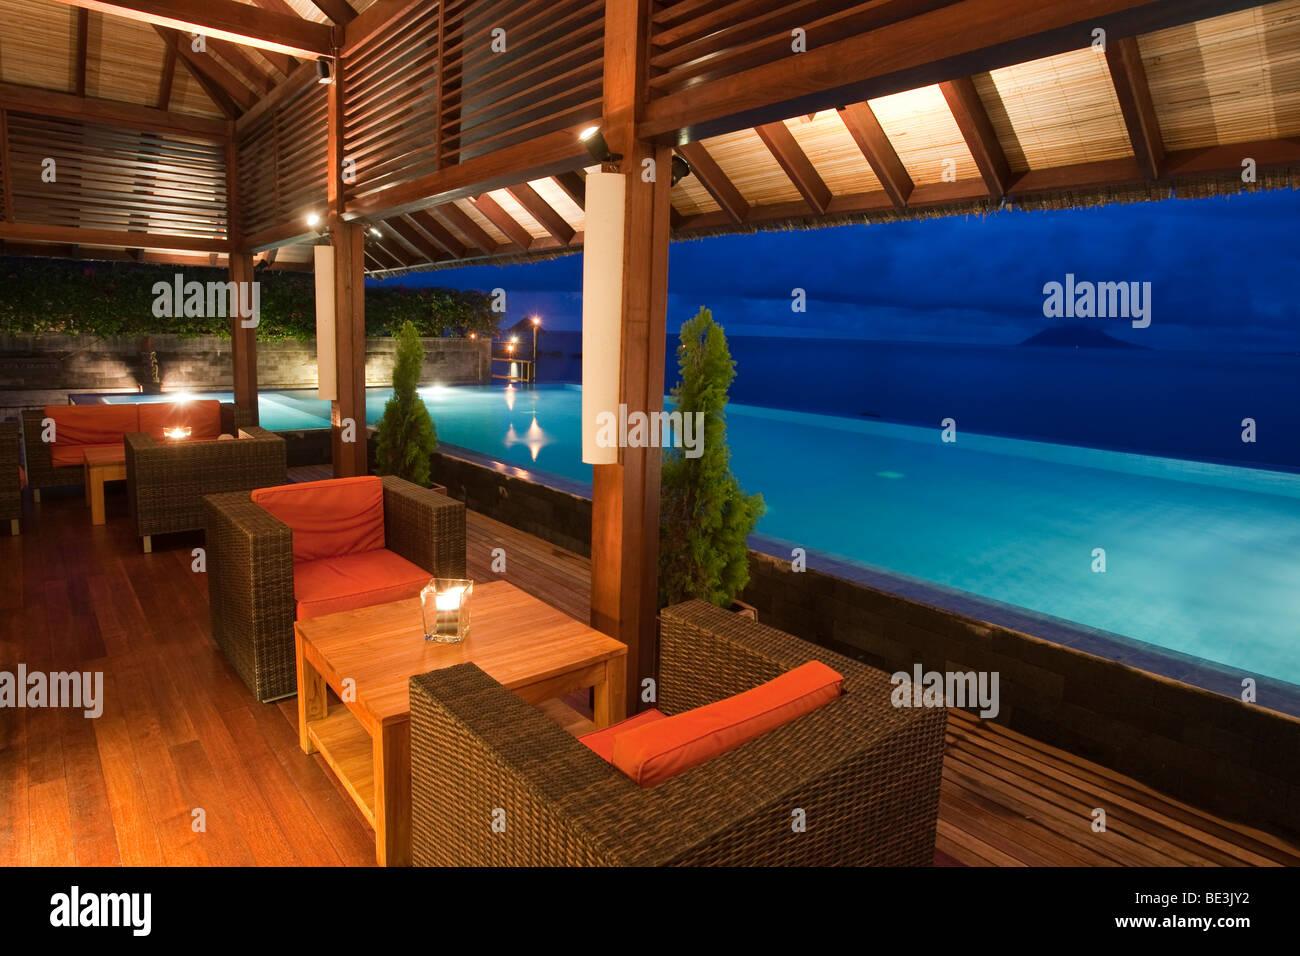 Indonesian Furniture Stock Photos & Indonesian Furniture Stock ...